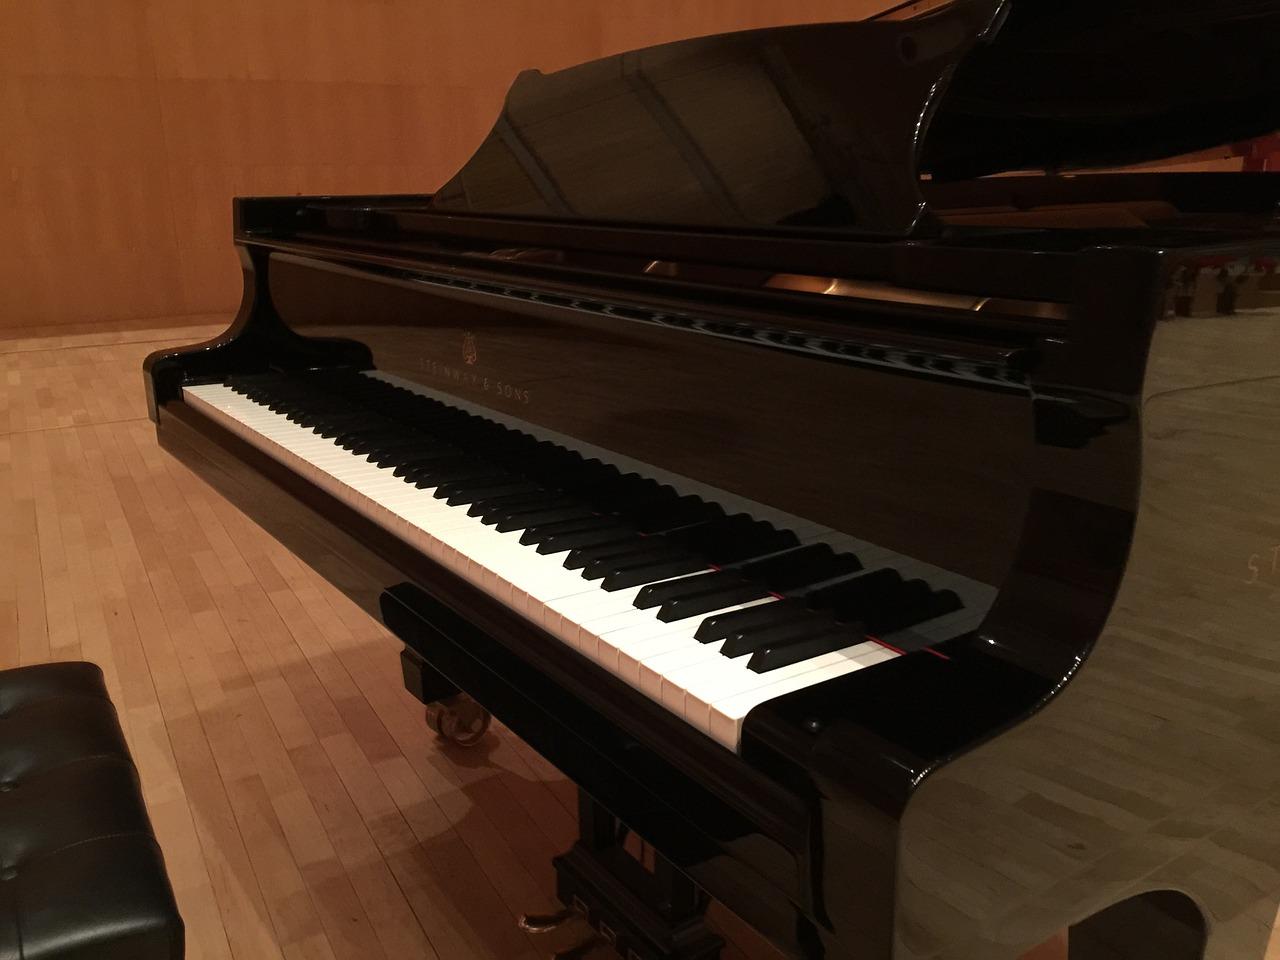 Alex_Shore_Buying_a_Piano_Advice_4